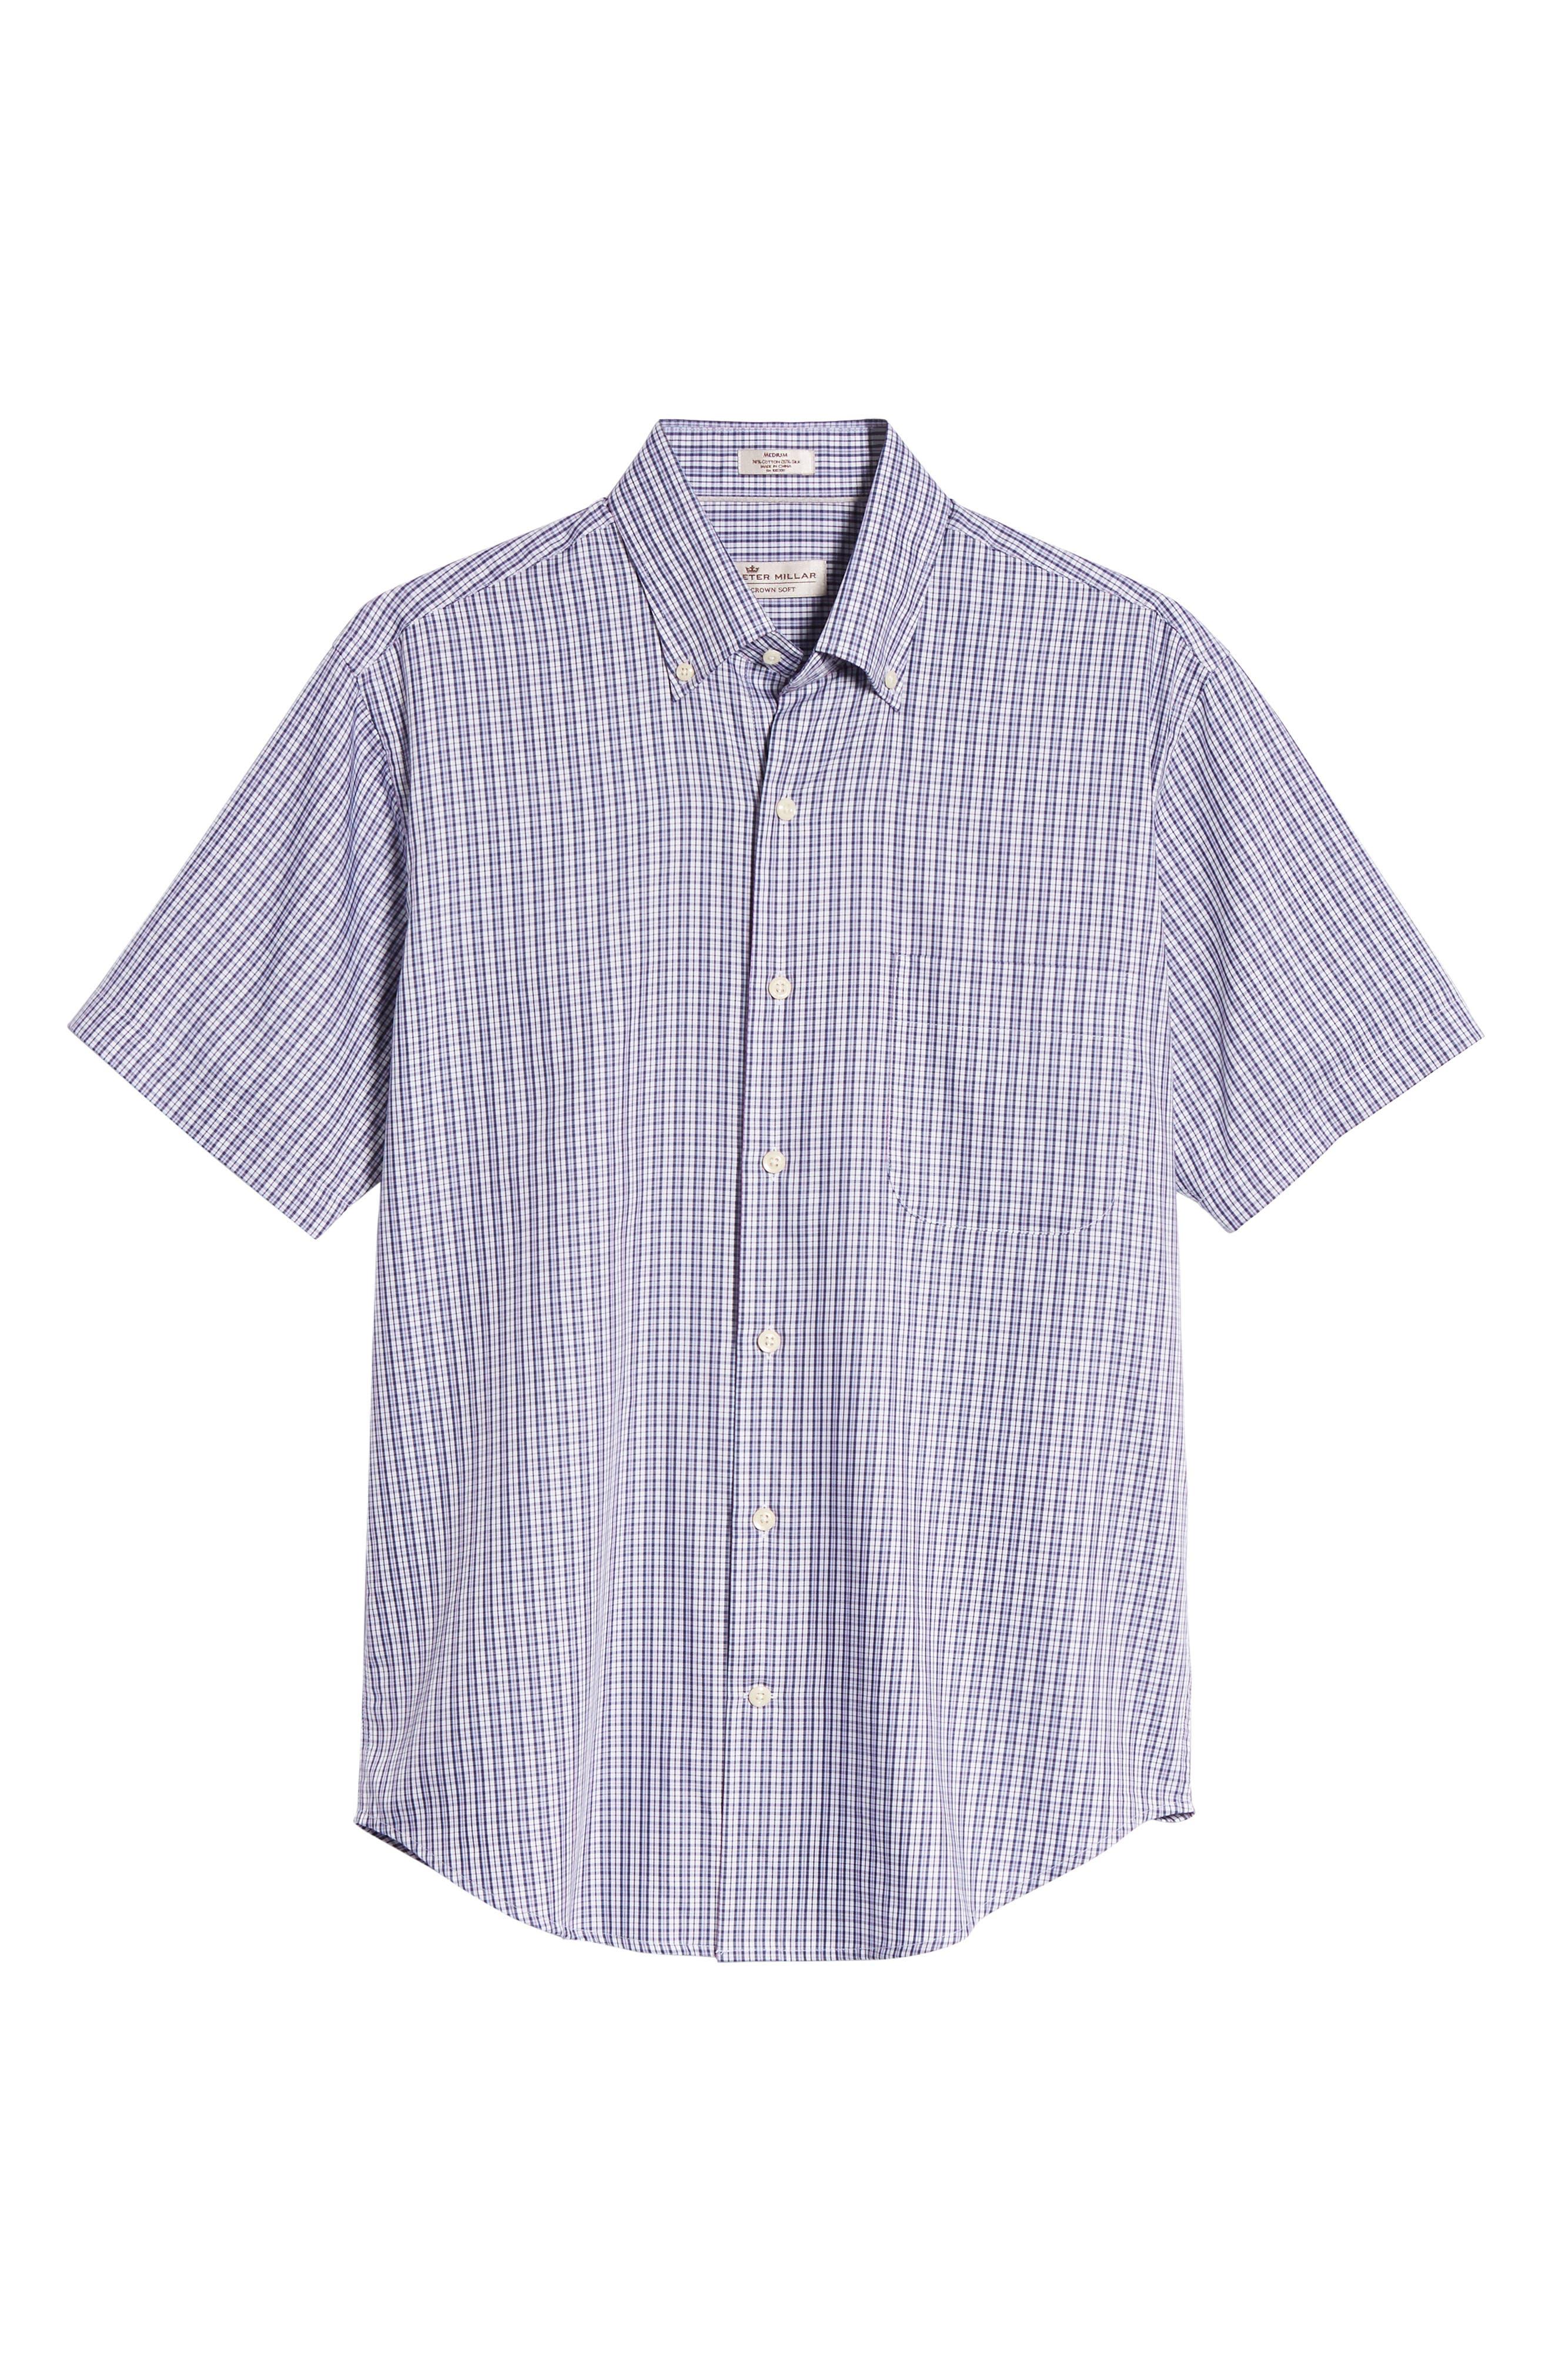 Crown Soft Carlsplaid Regular Fit Sport Shirt,                             Alternate thumbnail 6, color,                             412